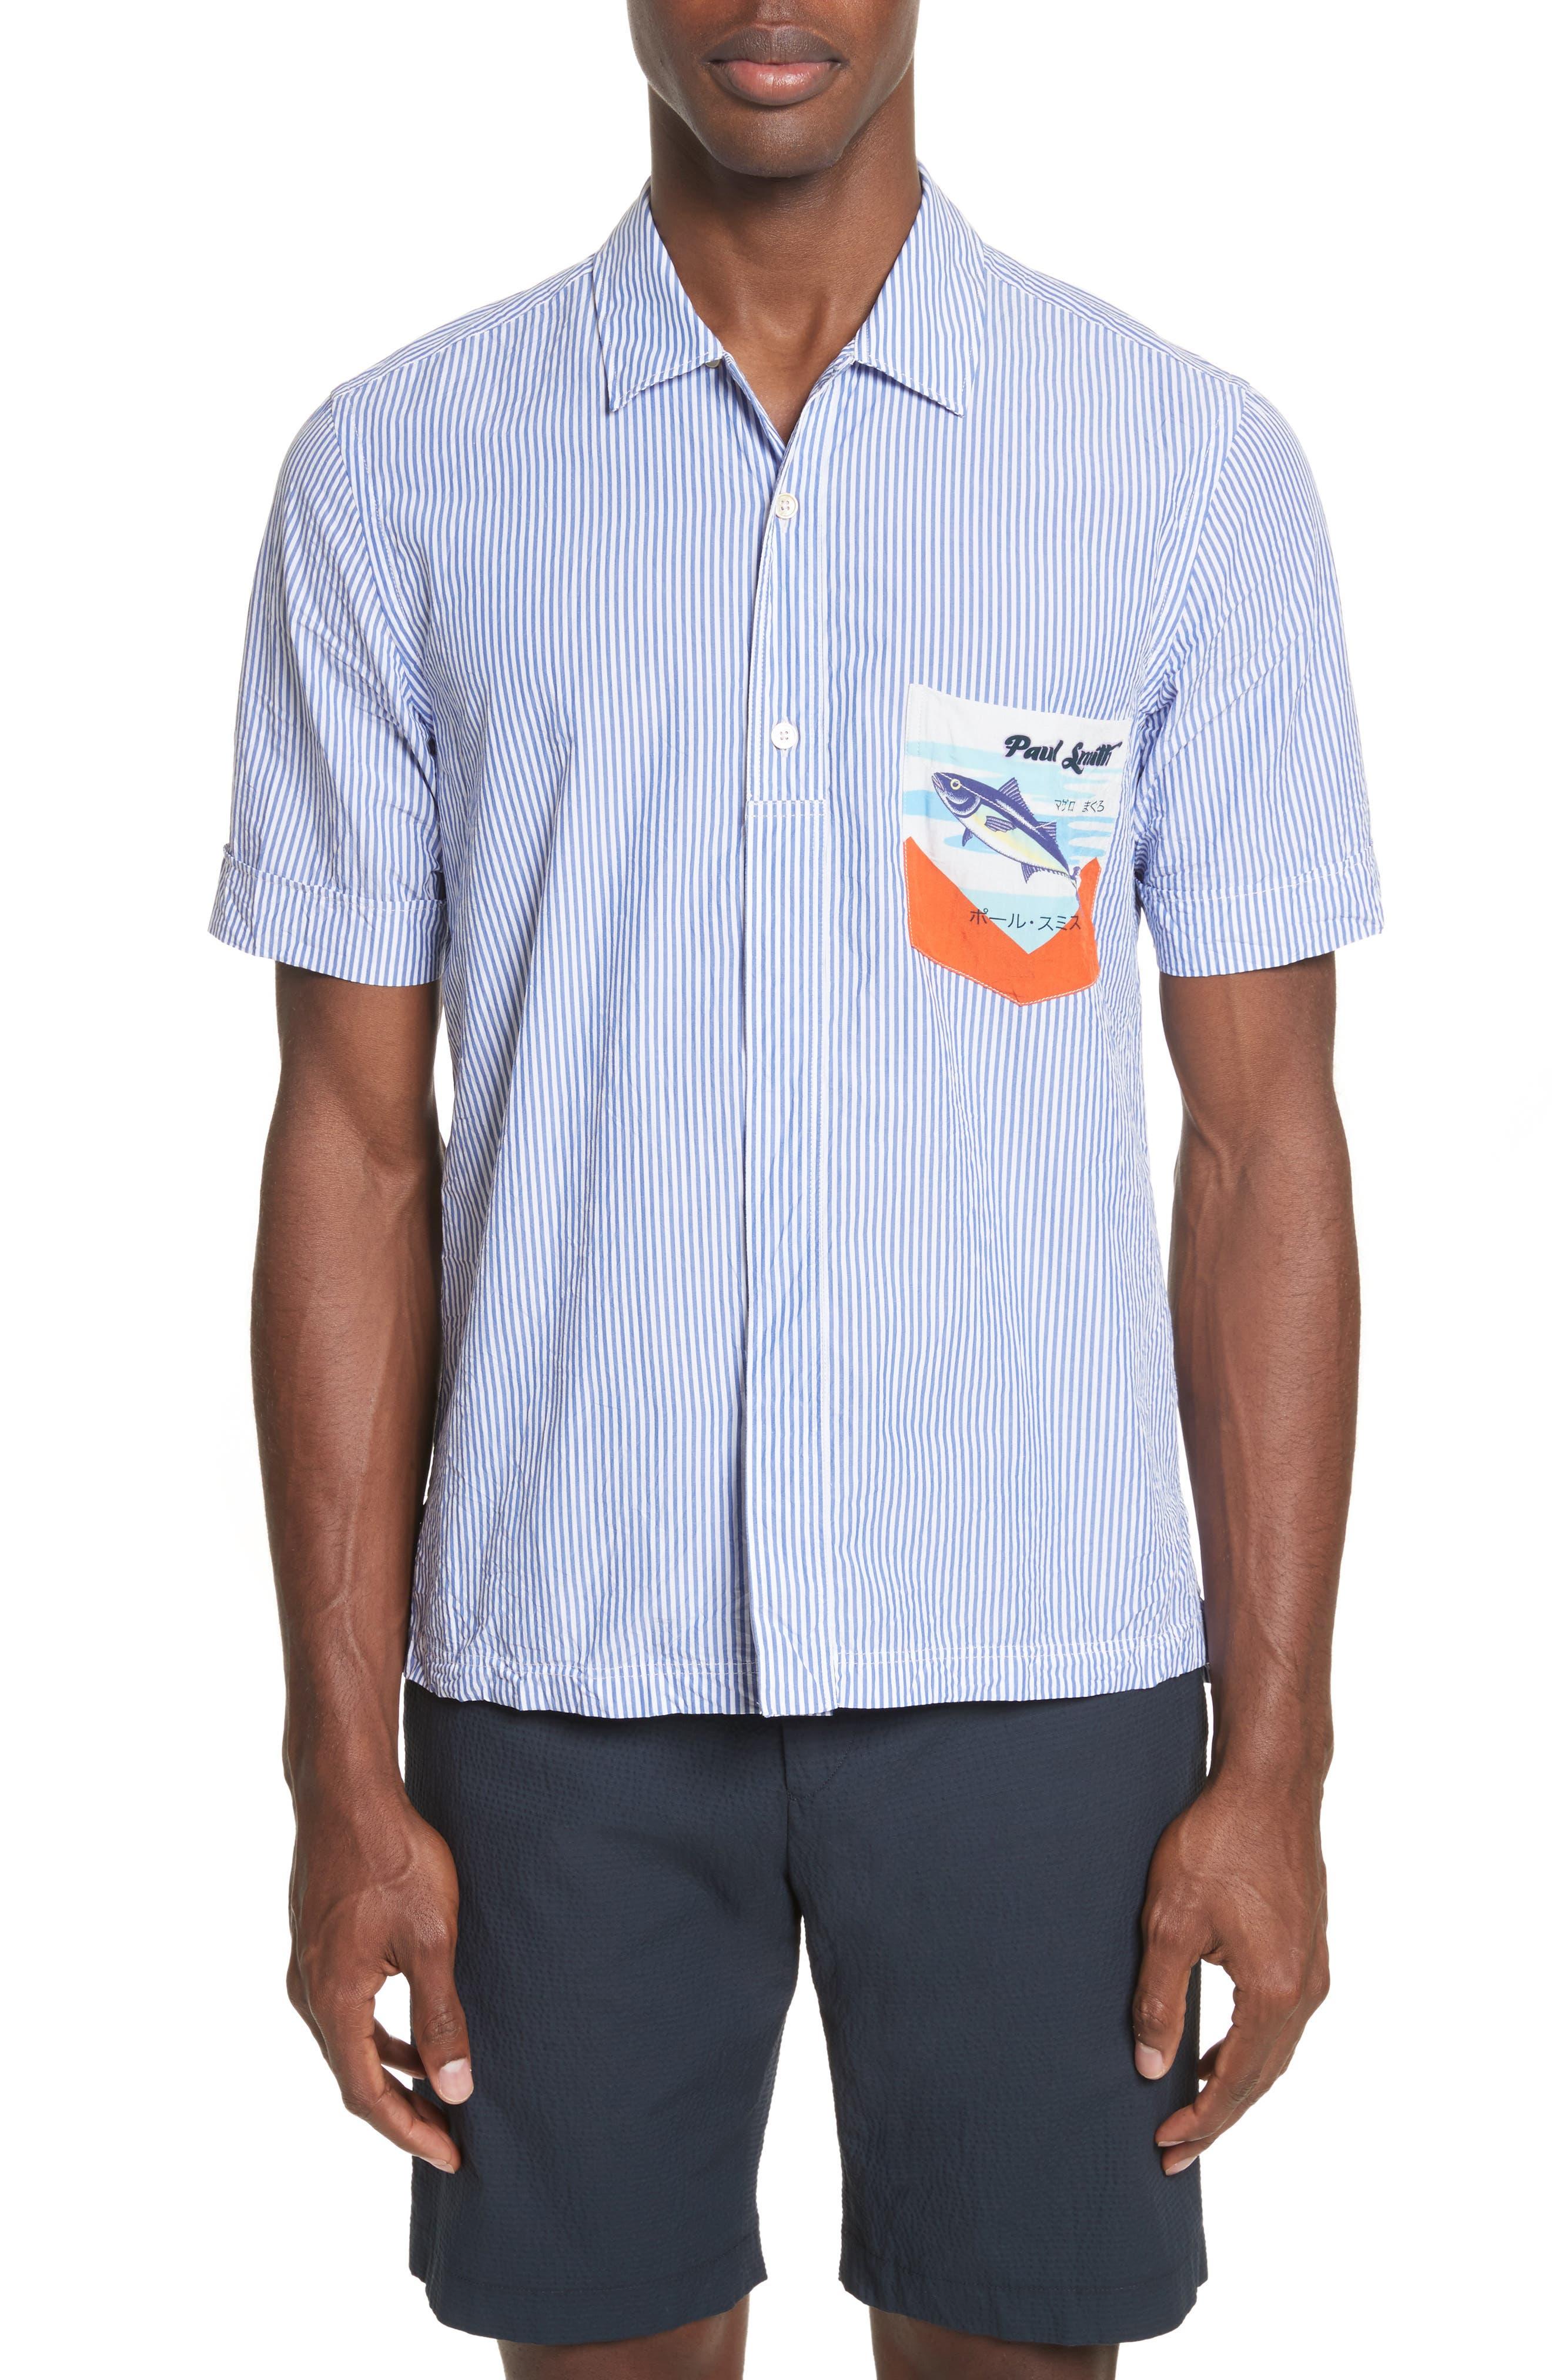 Paul Smith Stripe Seersucker Camp Shirt